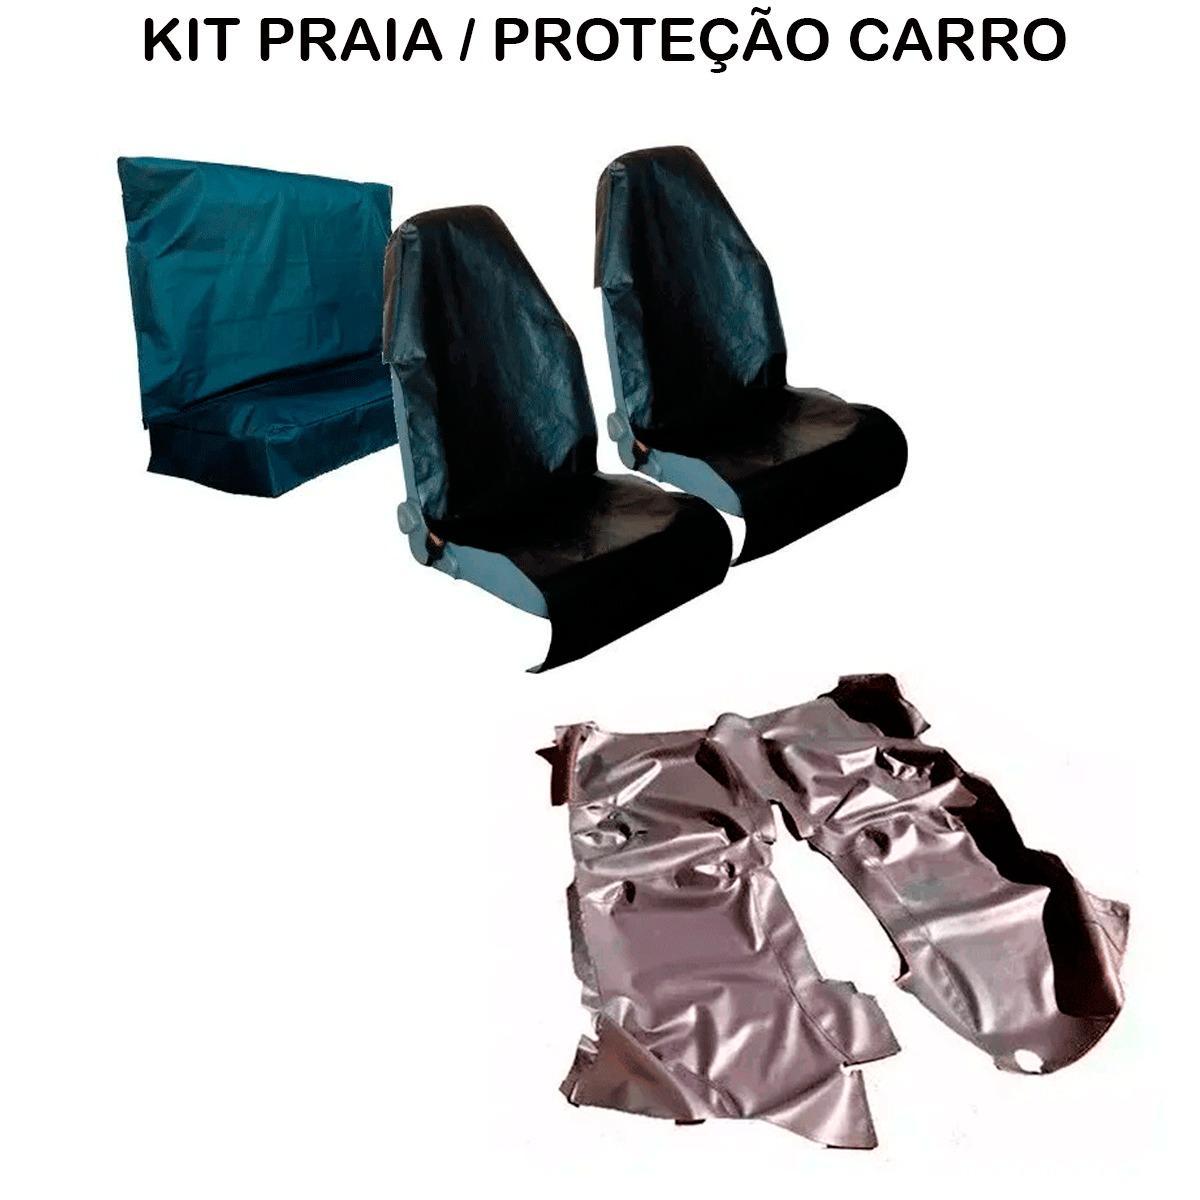 Tapete Em Vinil Mitsubishi L200 Dupla Triton + Capa Banco Protecao Banco Areia Suor Academia